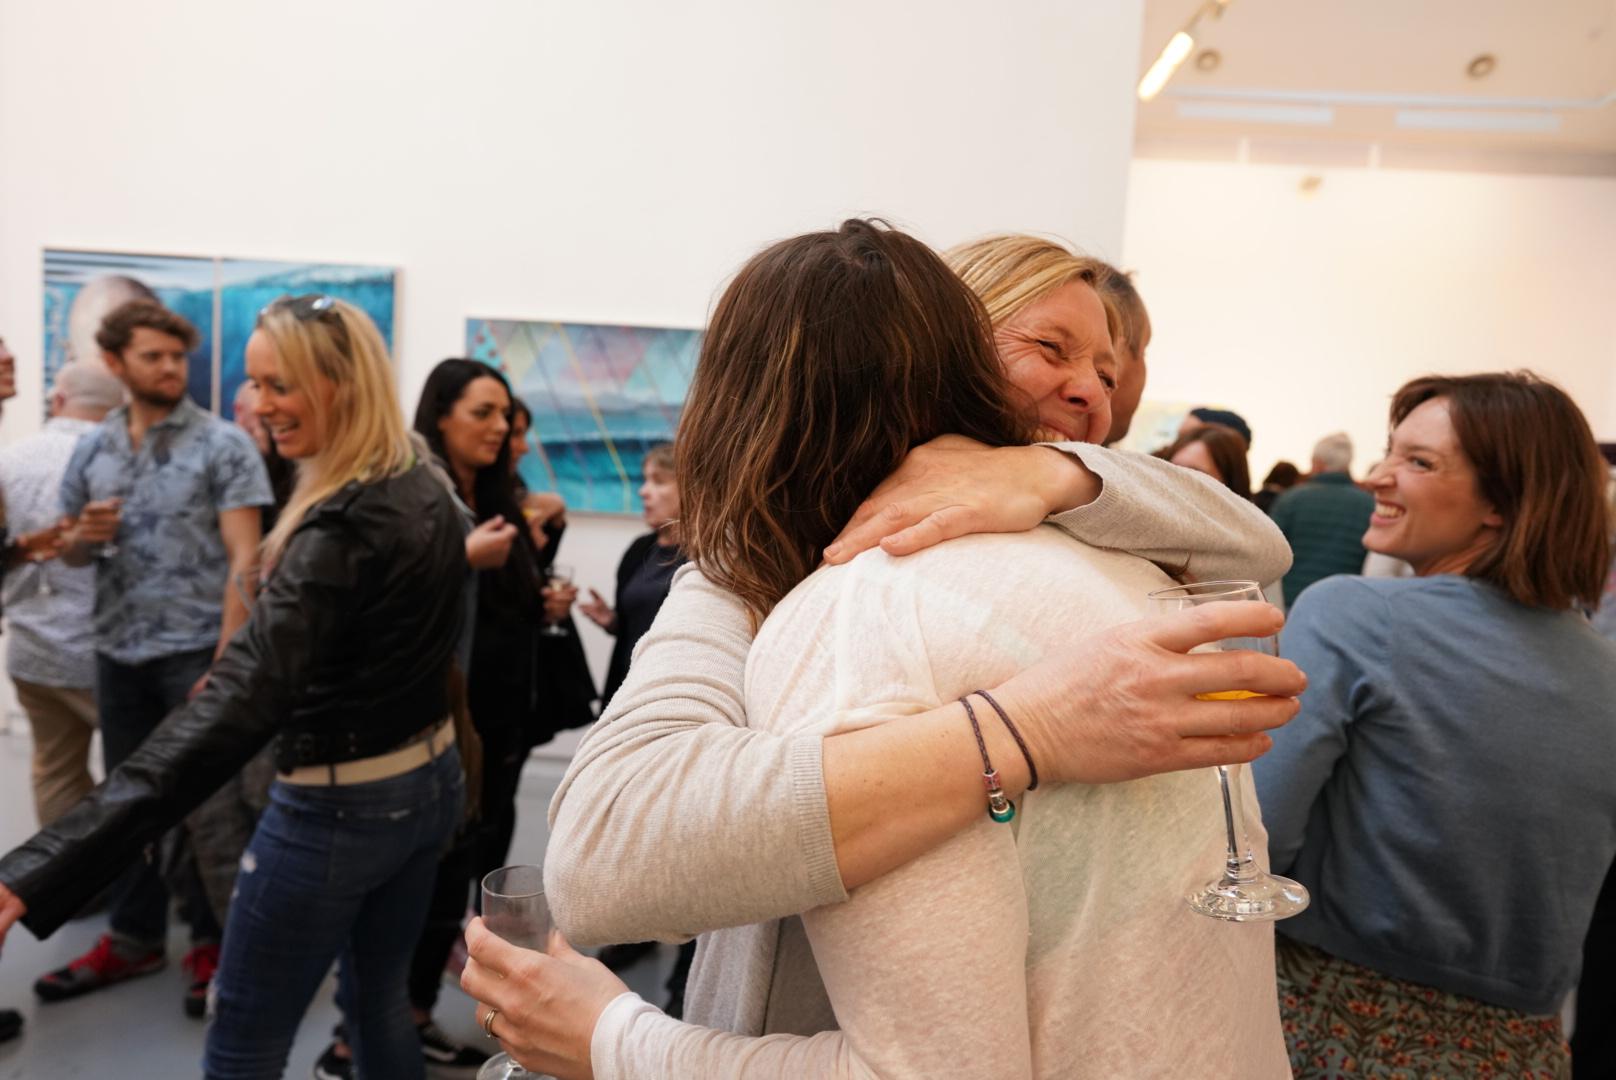 Hug from Lyndsey